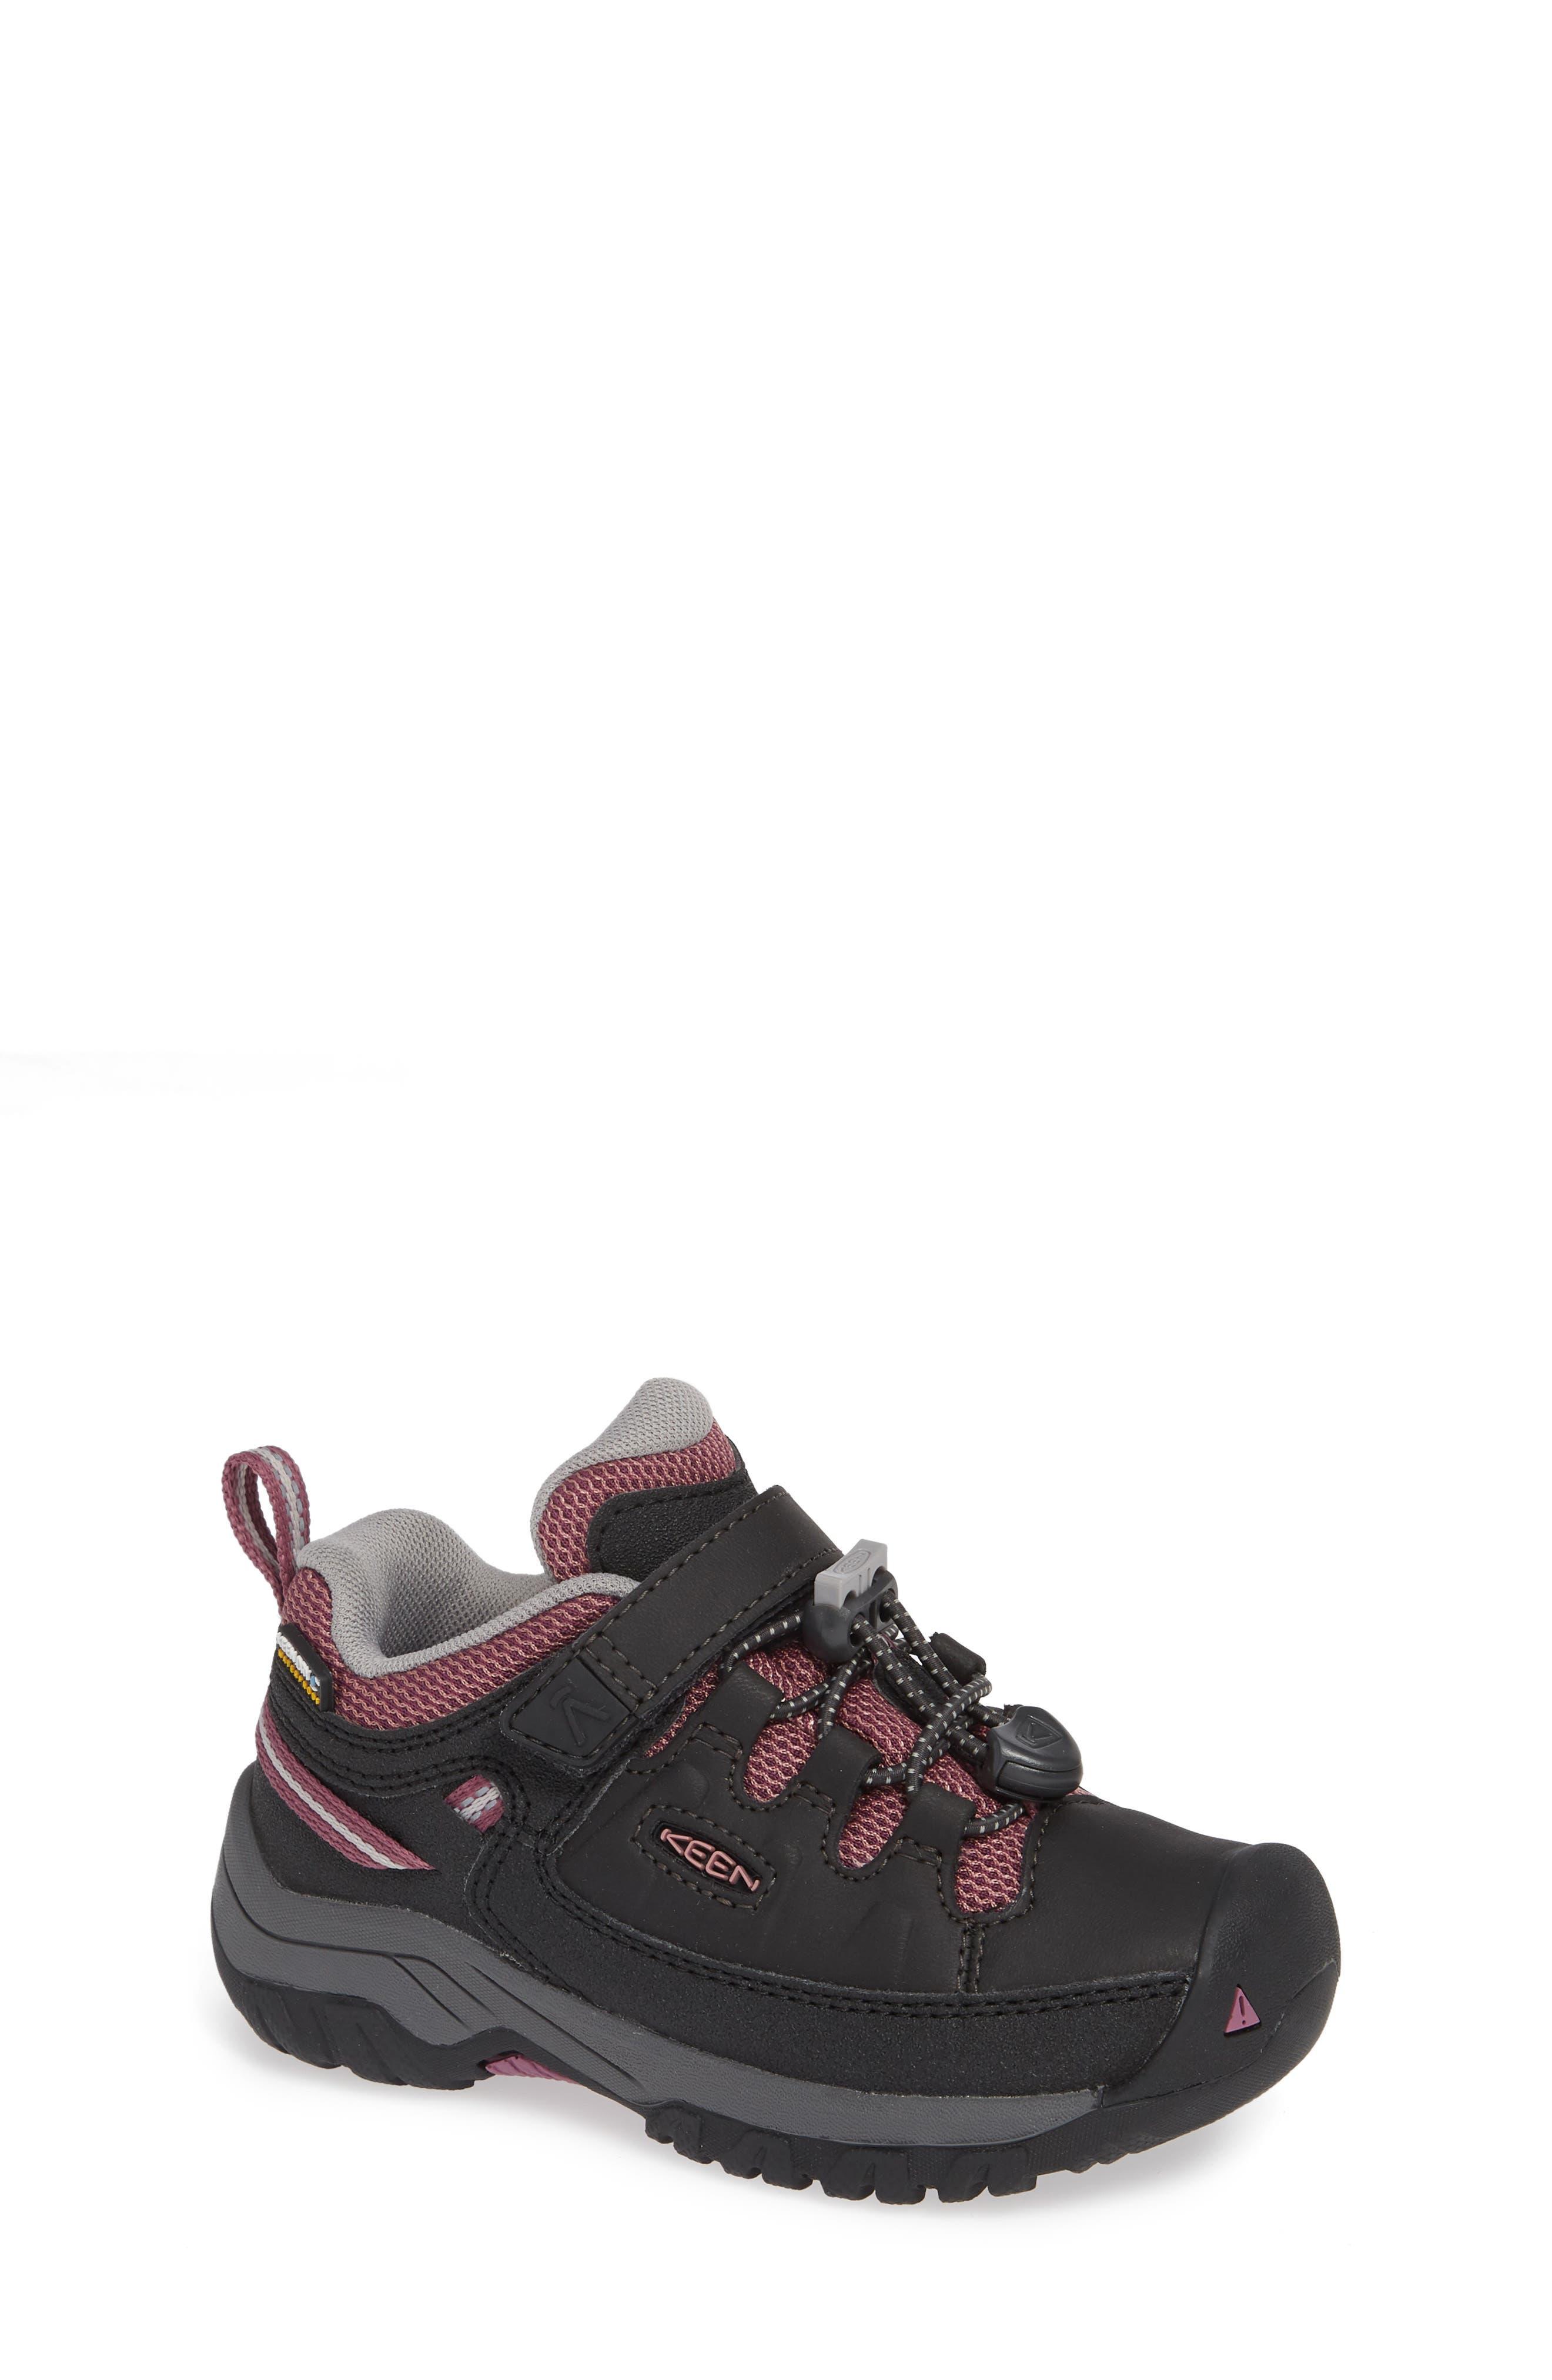 Targhee Low Waterproof Sneaker,                             Main thumbnail 1, color,                             RAVEN/ TULIPWOOD